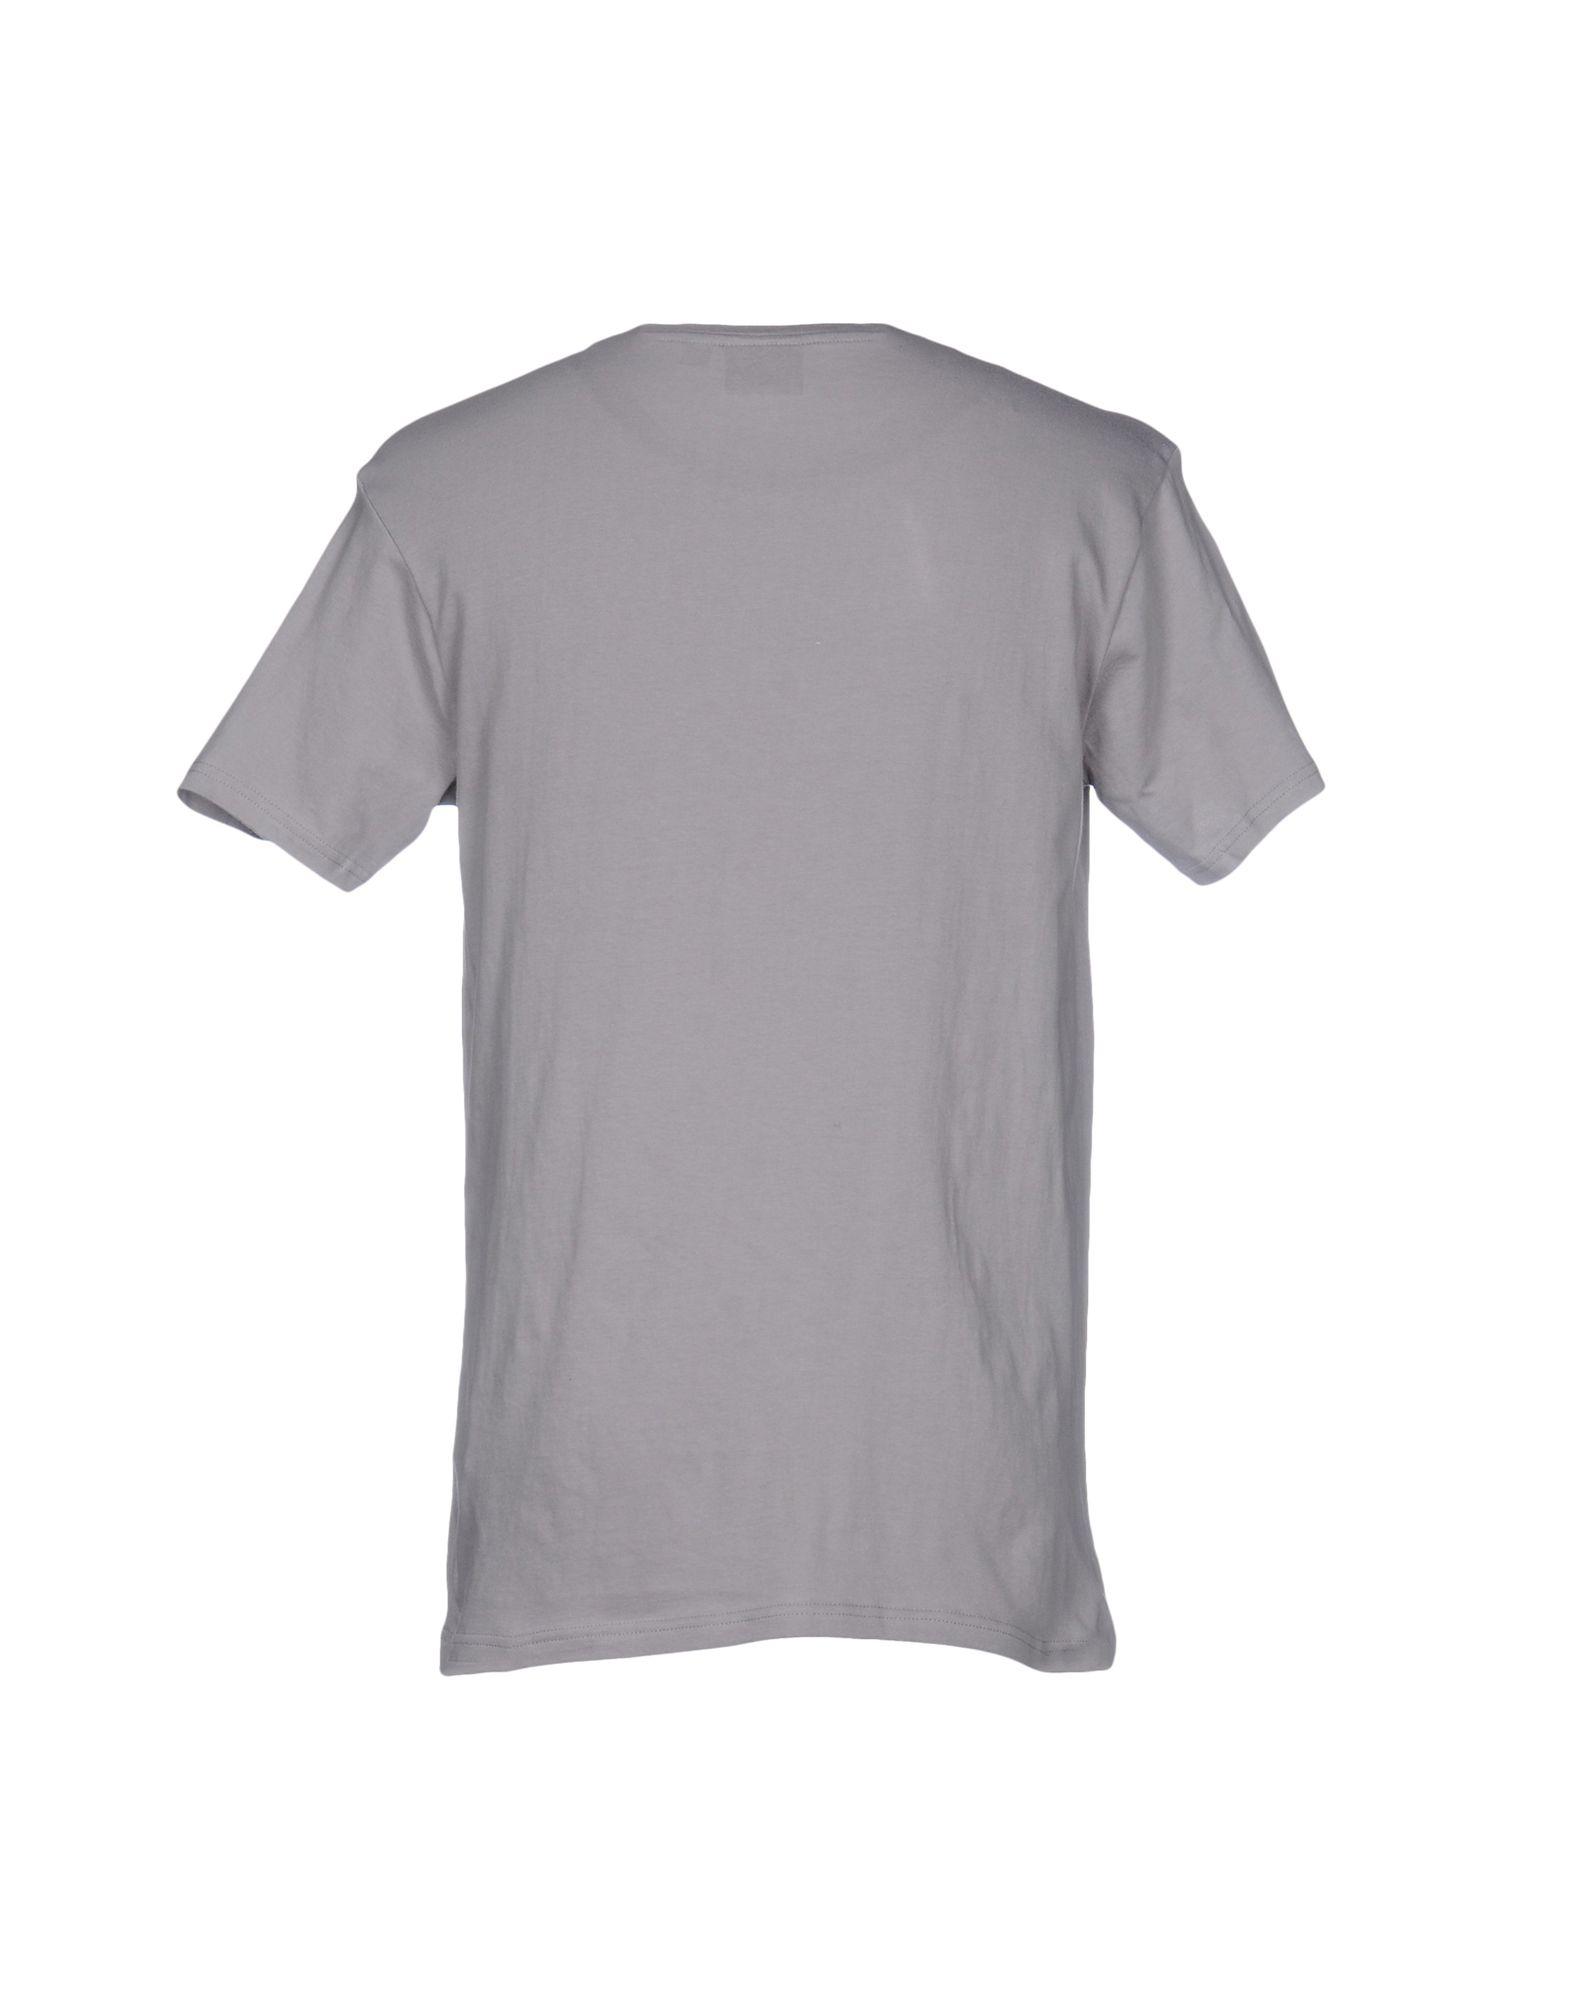 T-Shirt Dr. Dr. T-Shirt Denim Jeansmakers Uomo - 37979471BR 4bbae6